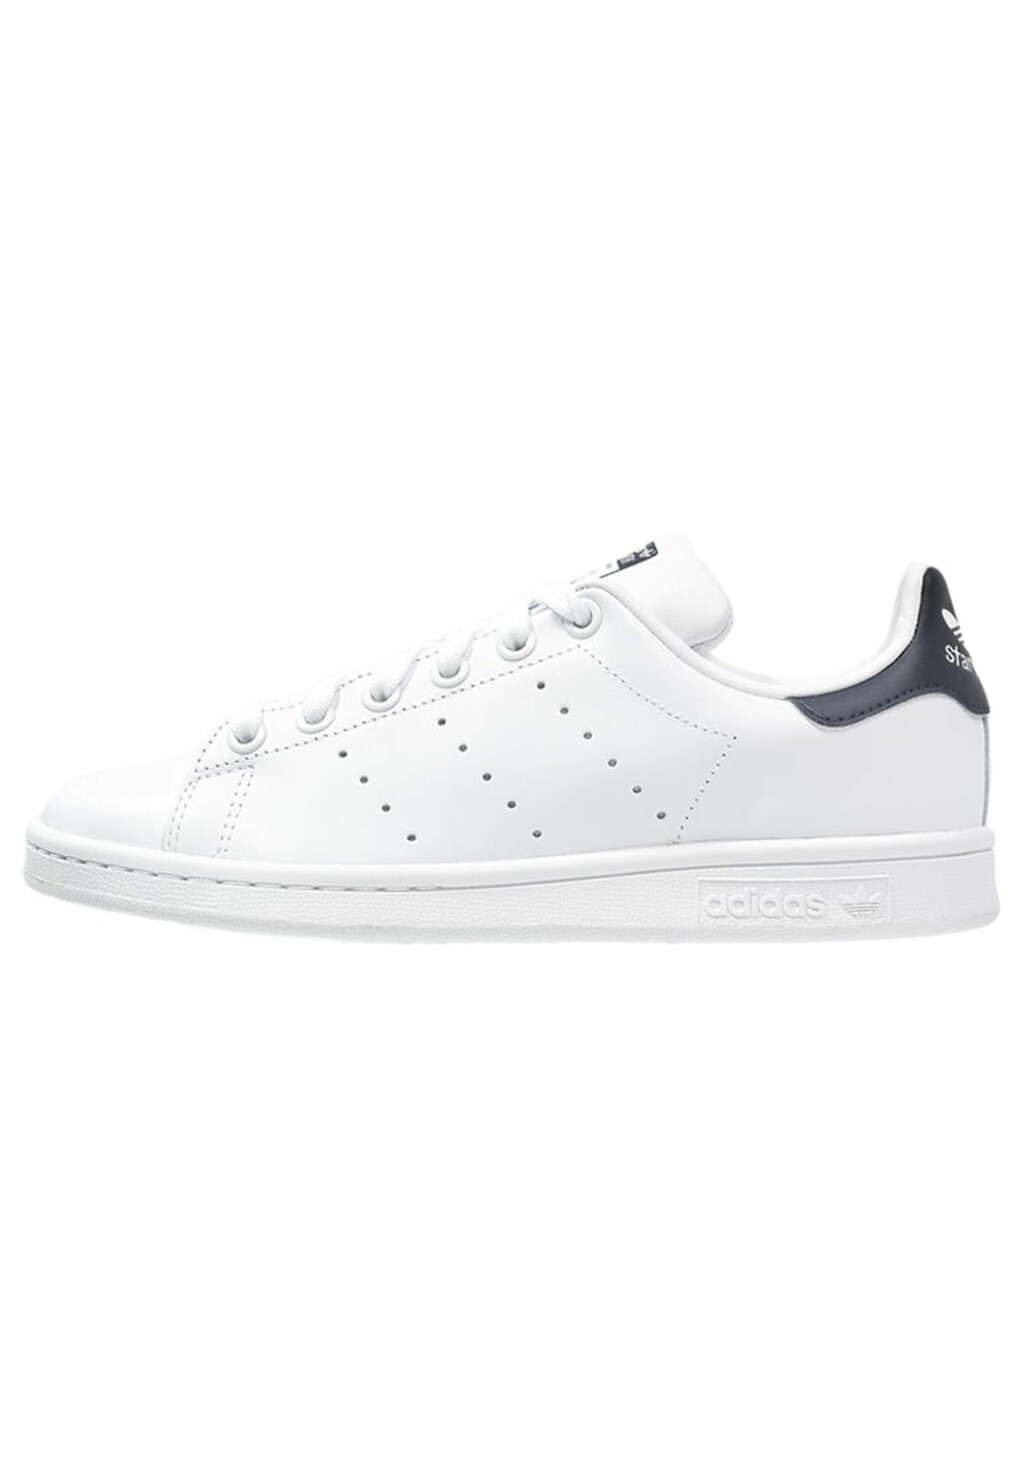 Stan Smith-sneakers fra Adidas med sort detalj via Zalando.no   kr 849